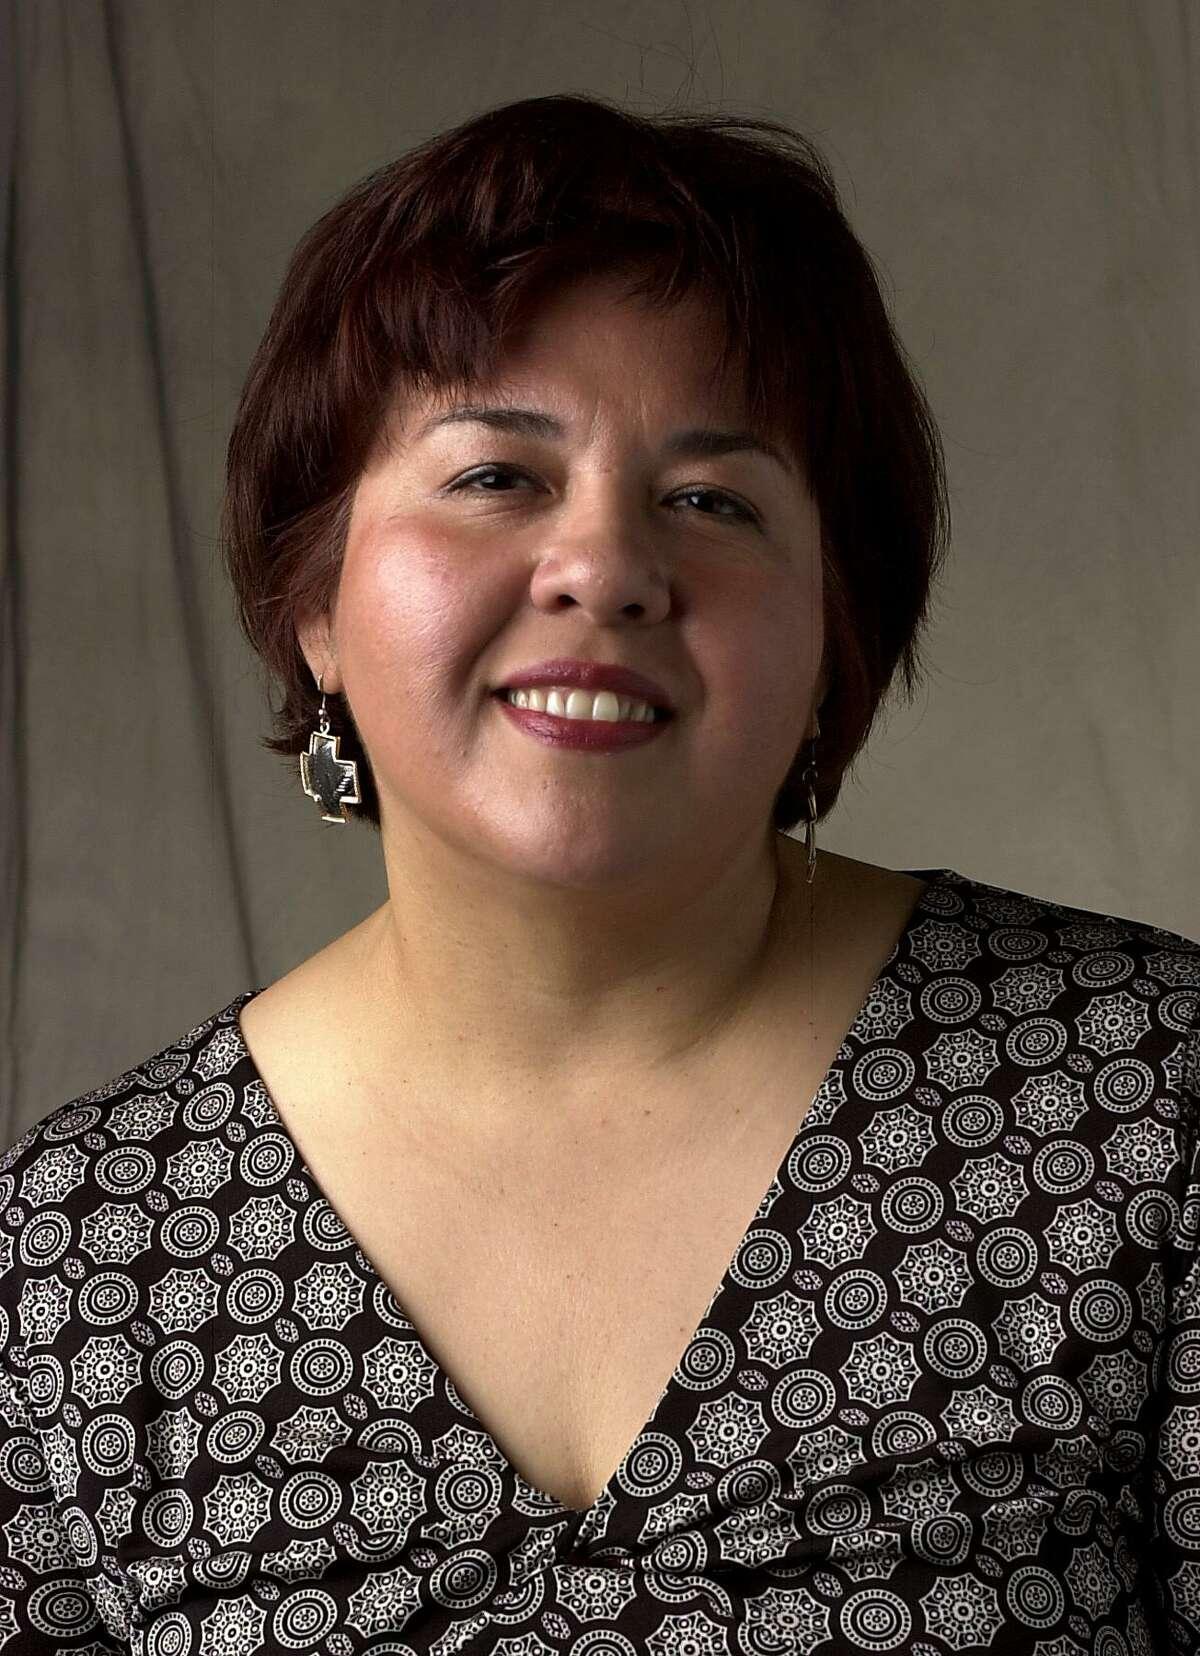 Photo of Elaine Ayala, Express-News employee. 9/28/04. Photo by Juanito Garza/Staff.